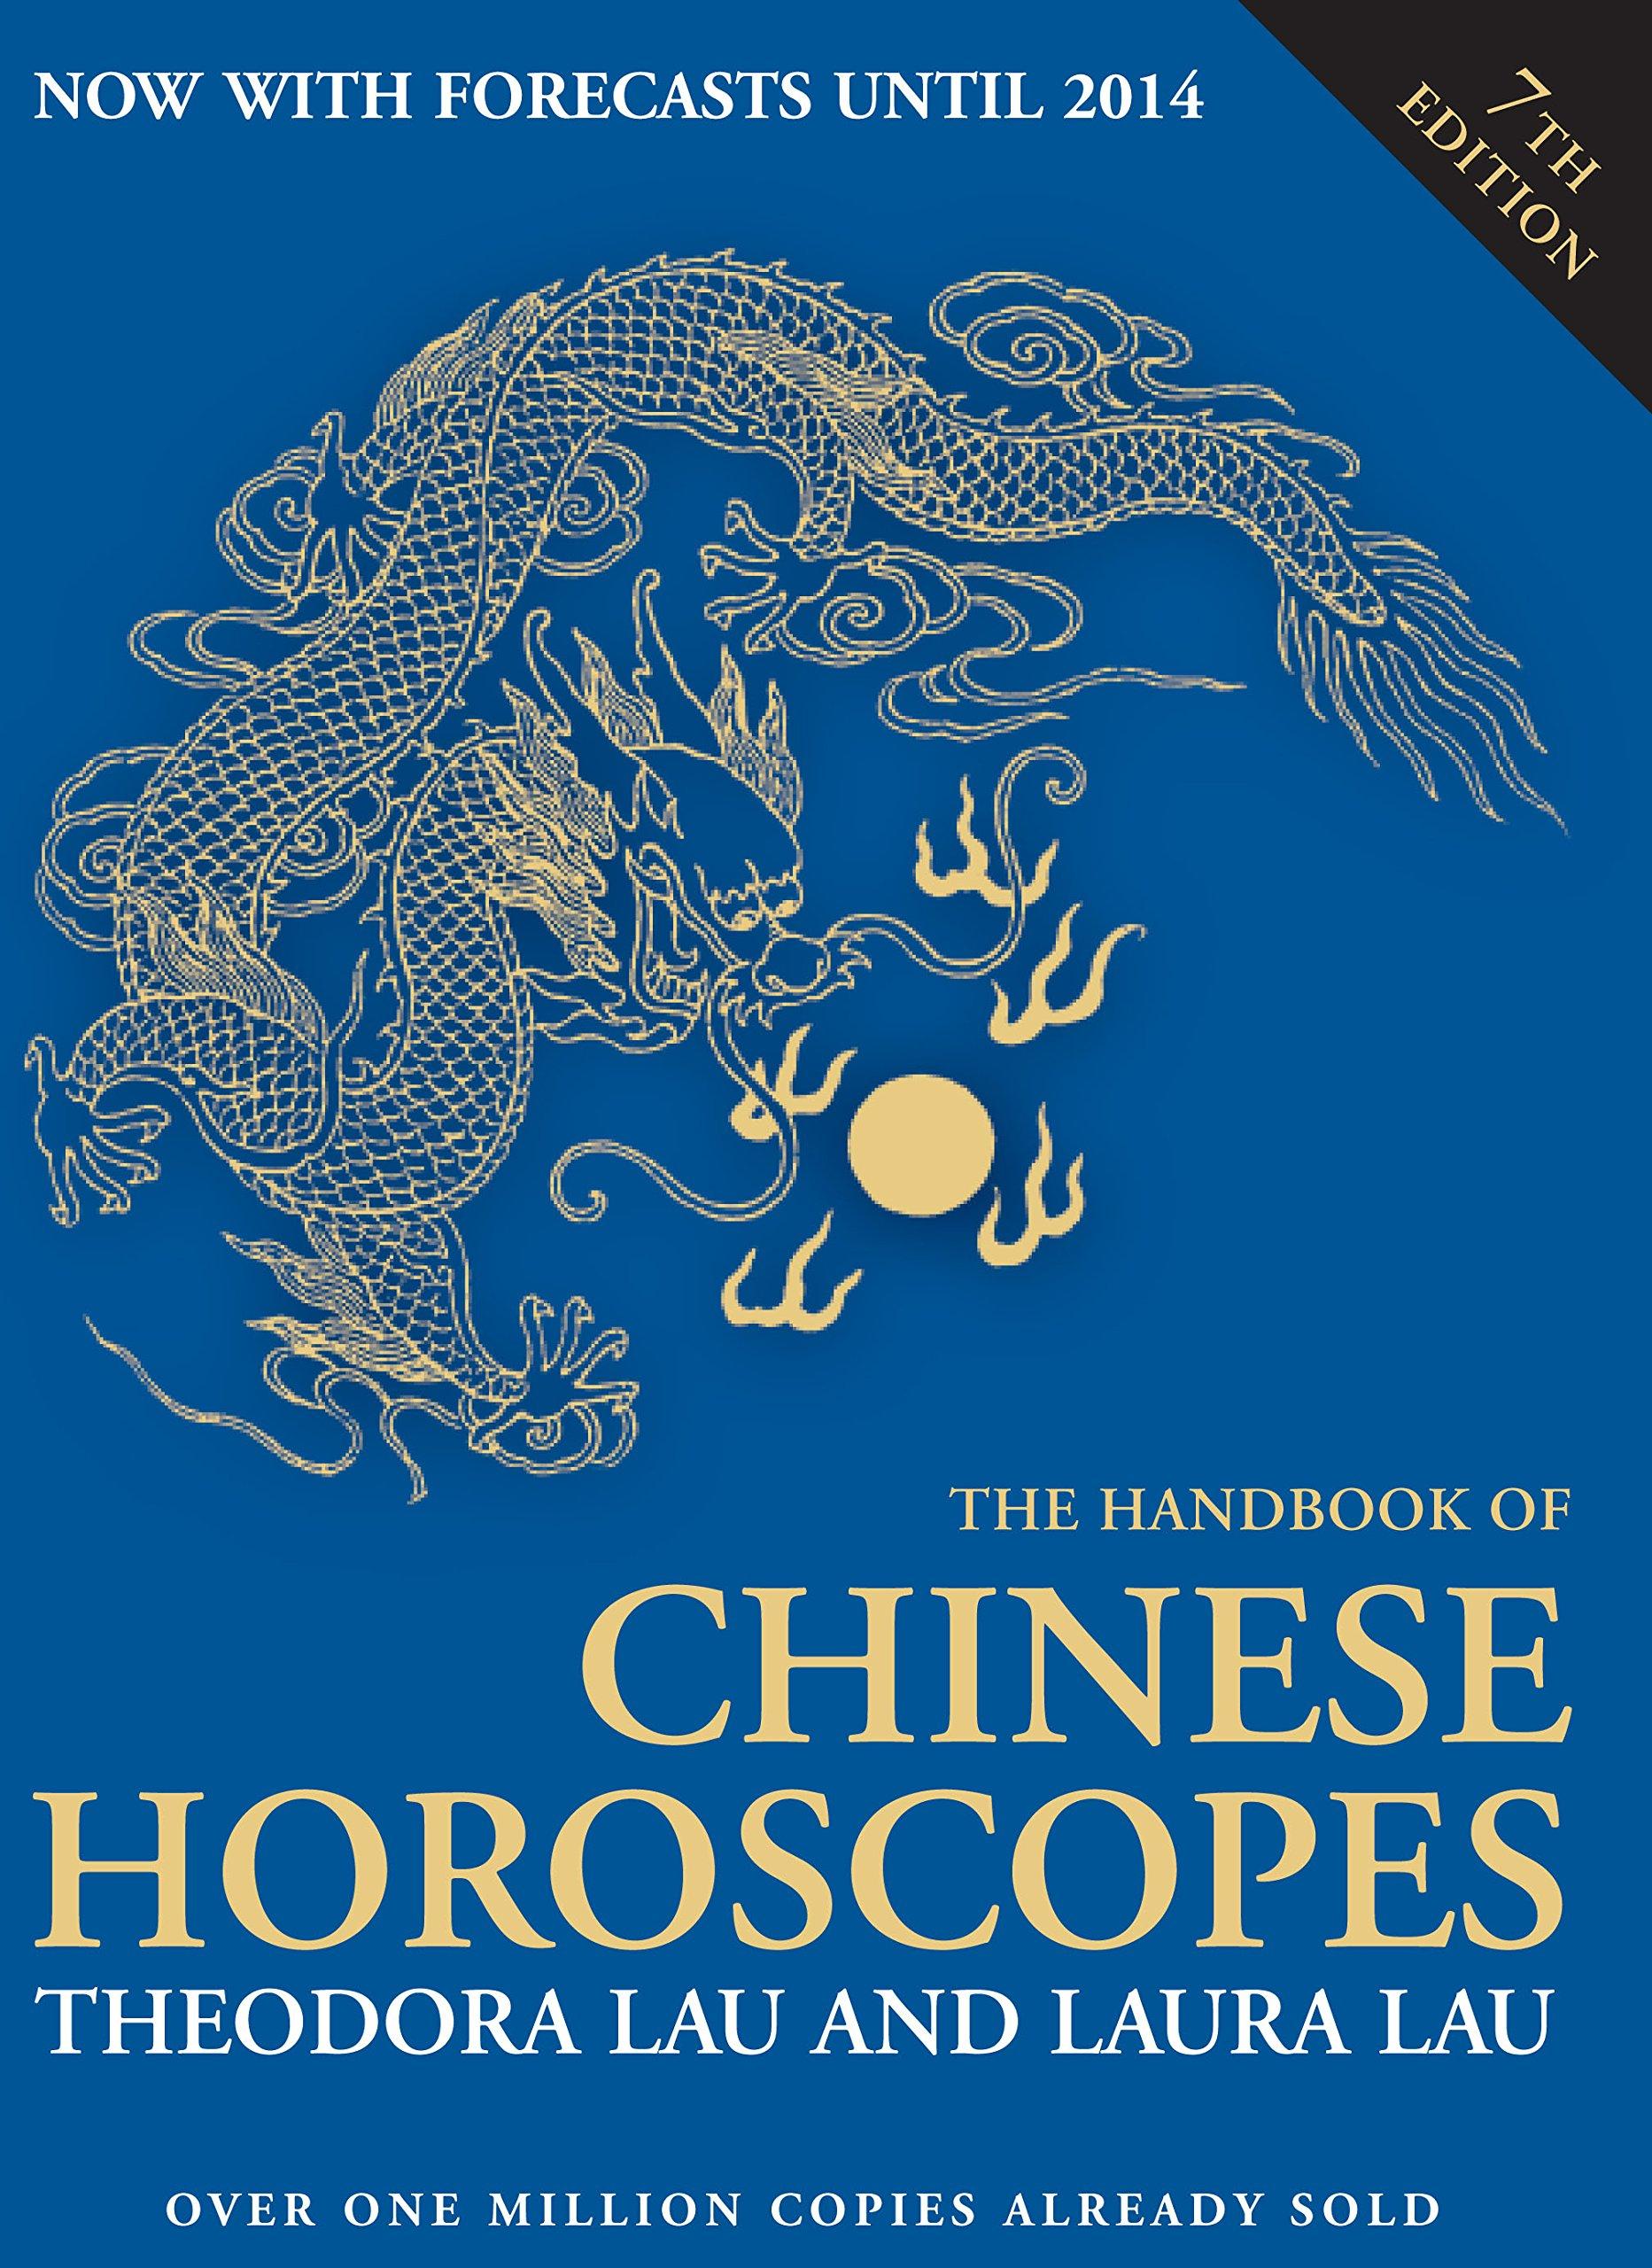 The Handbook Of Chinese Horoscopes Theodora Lau 9780285640467